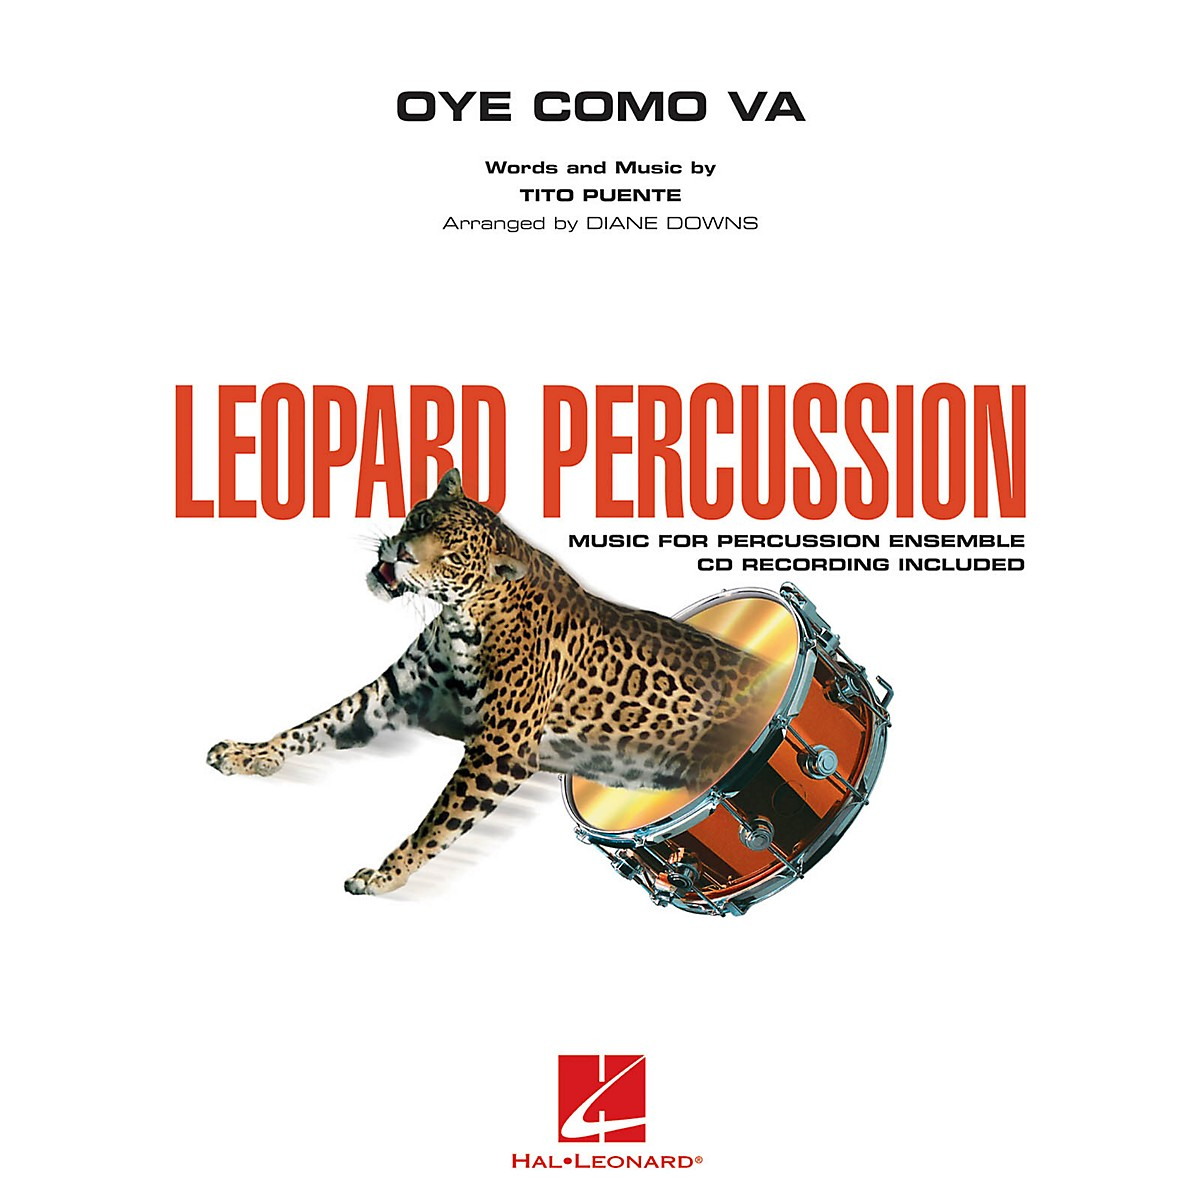 Hal Leonard Oye Como Va (Leopard Percussion) Concert Band Level 3 by Santana Arranged by Diane Downs